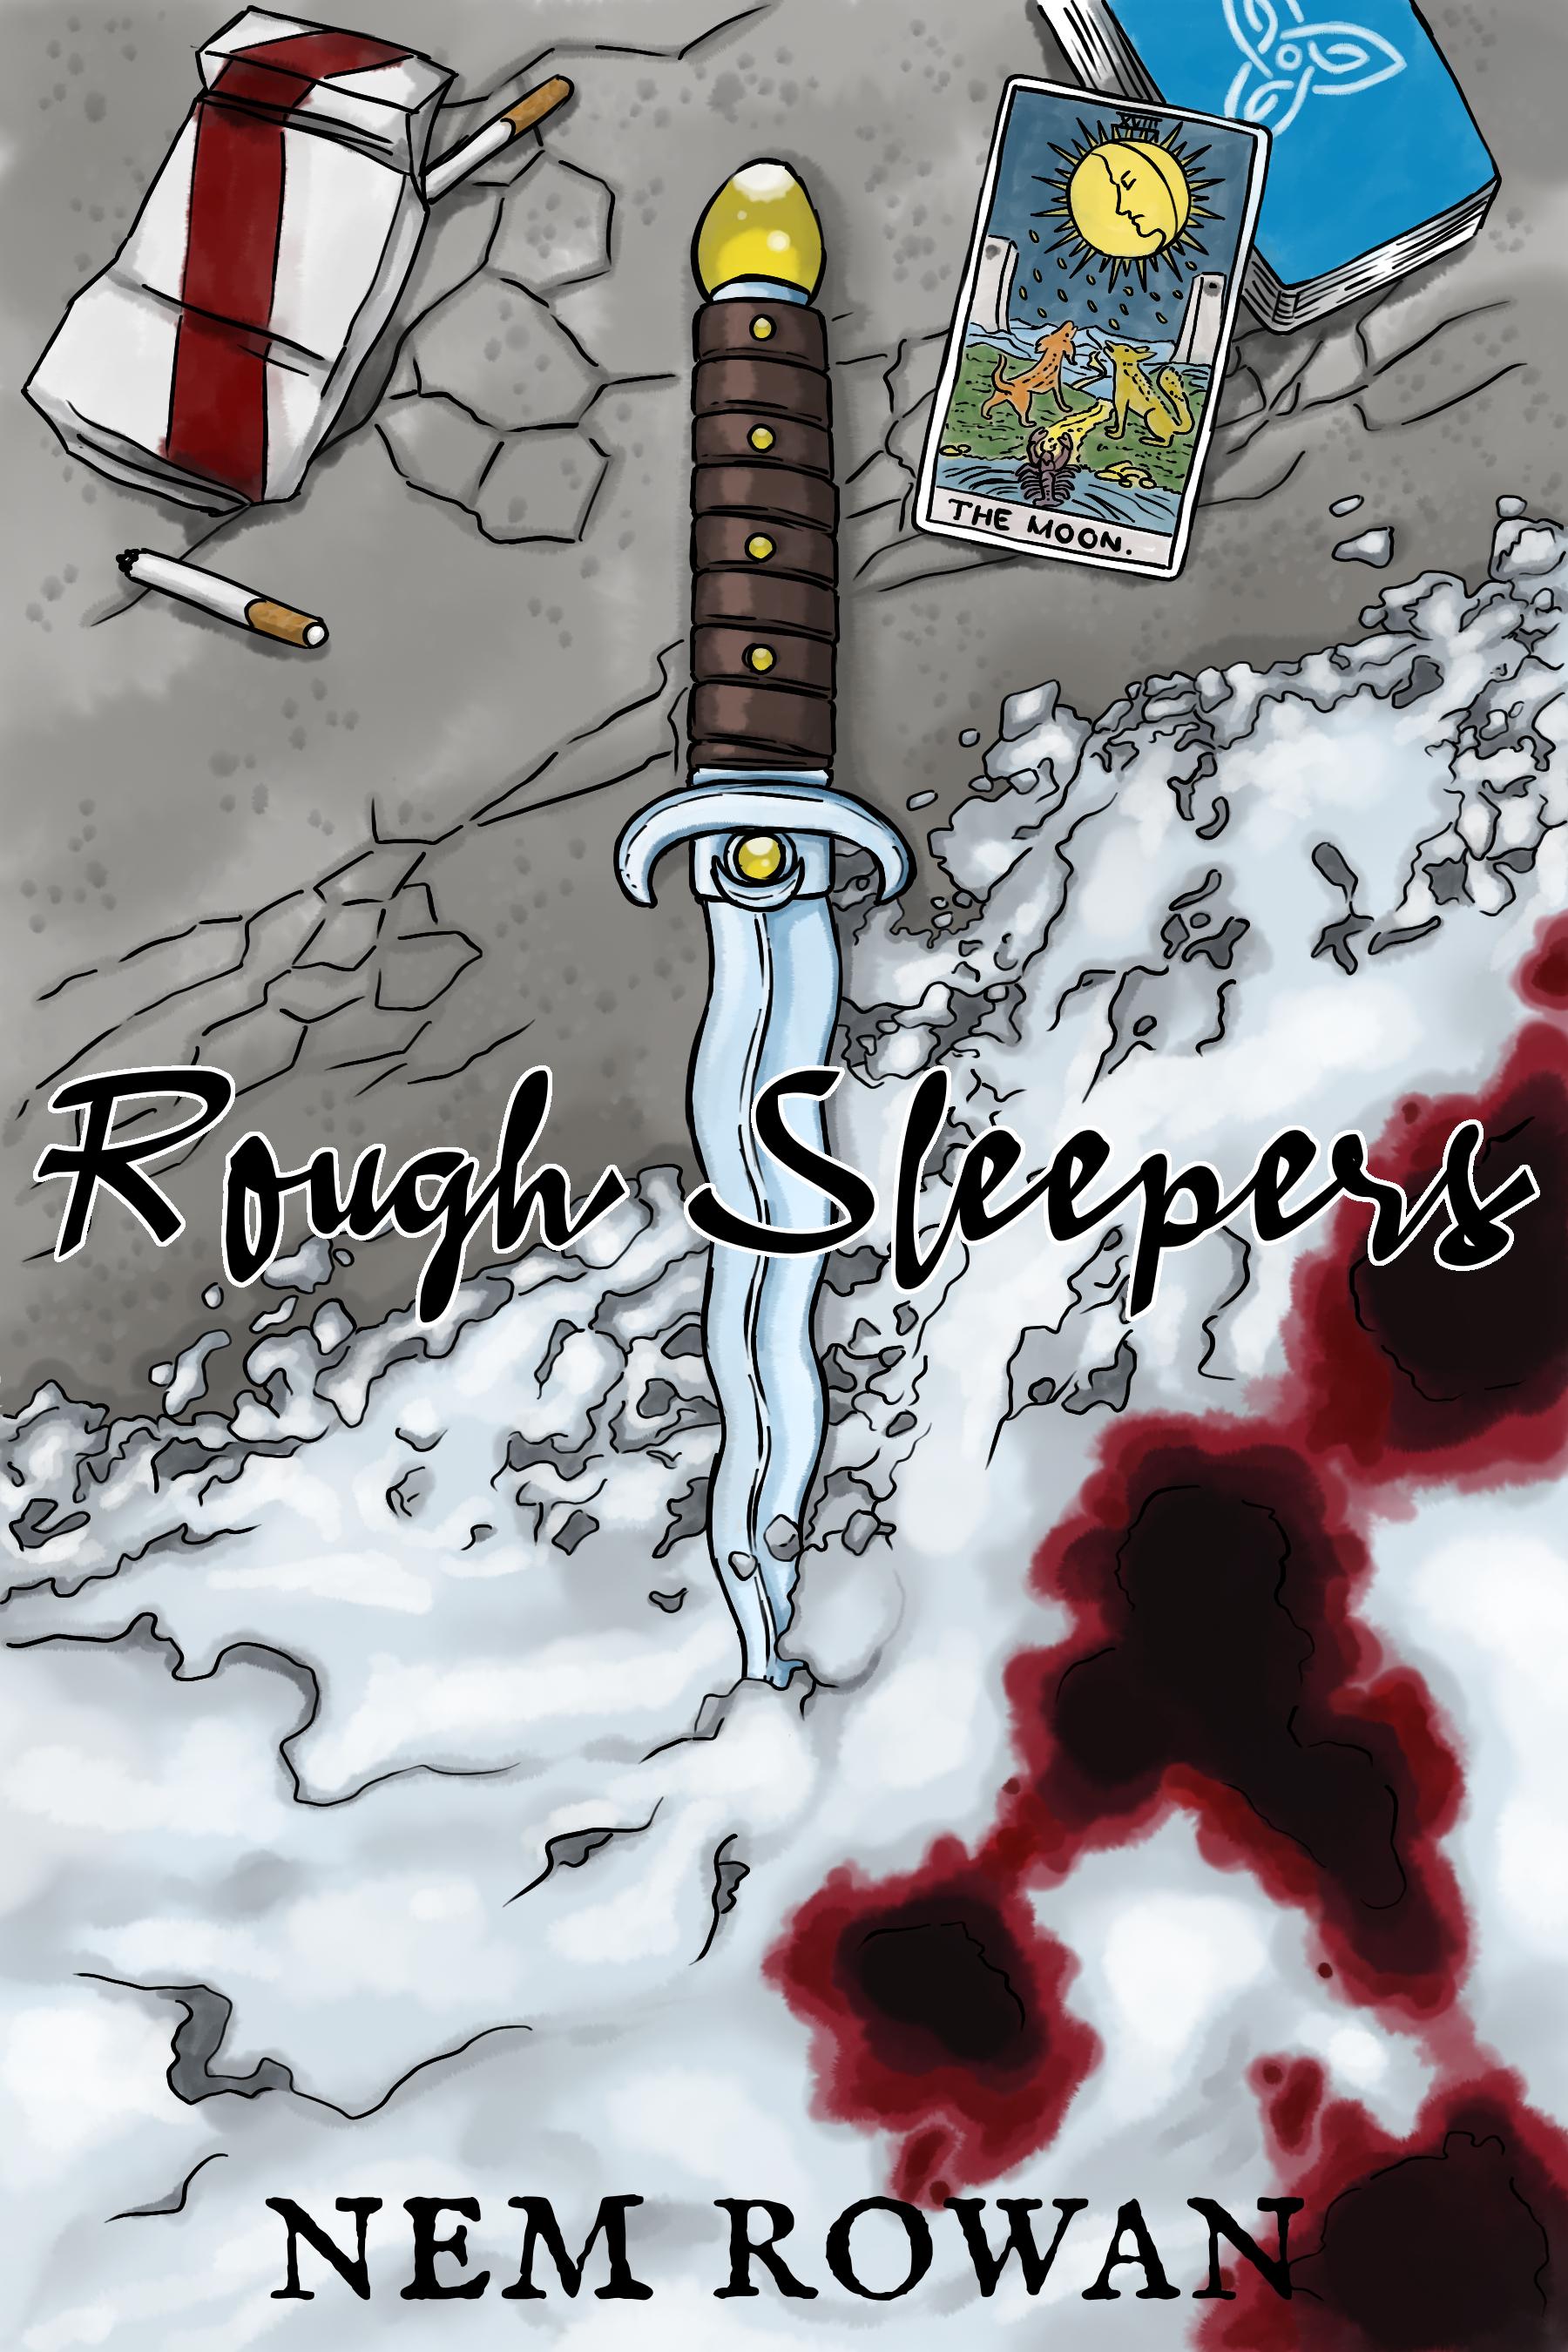 roughsleepers1